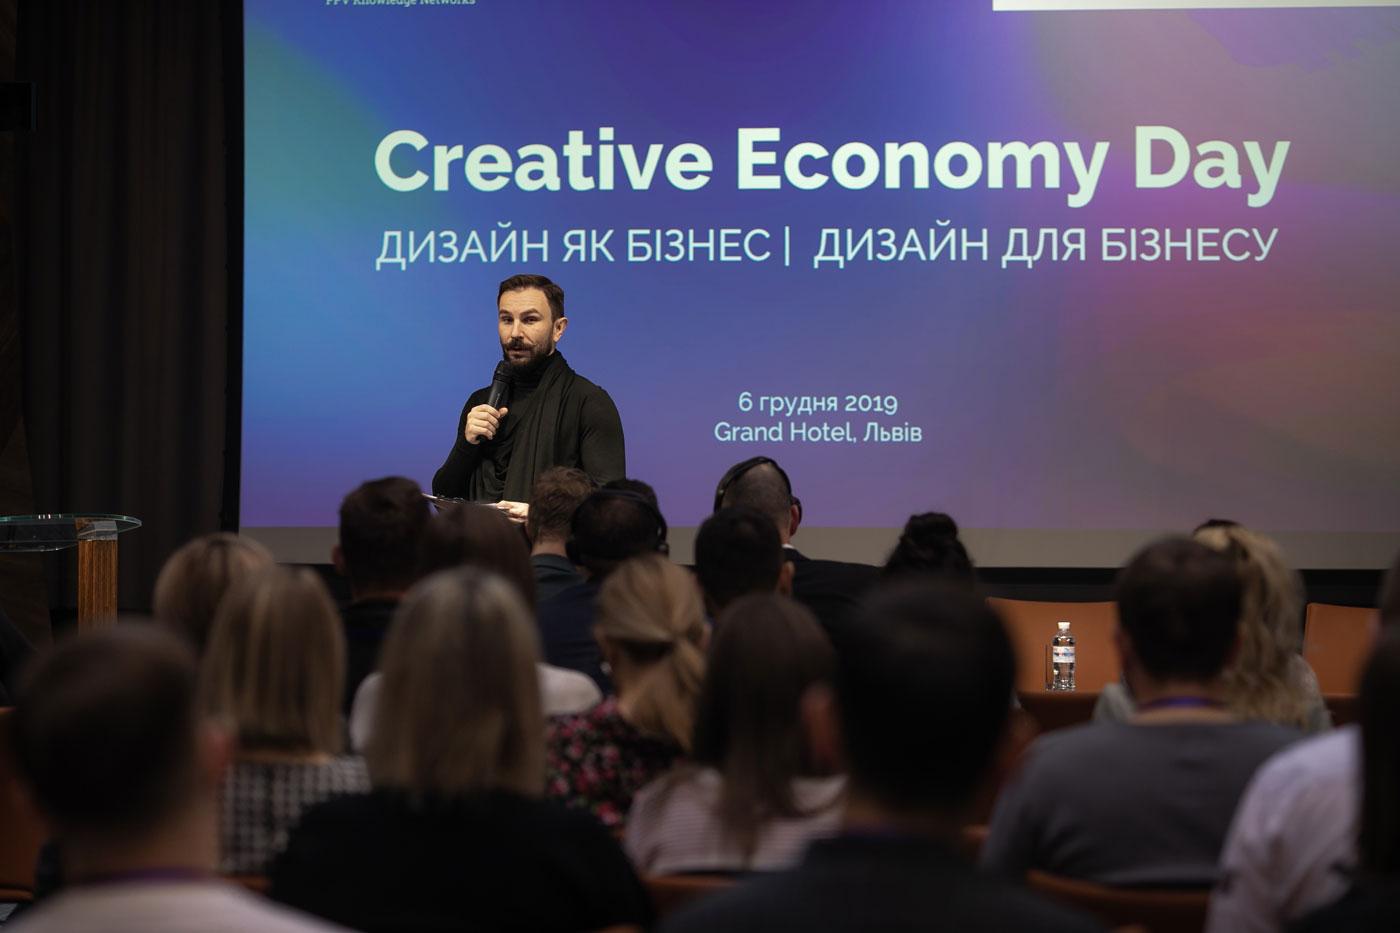 ✍️ Naviščo nam predmetnyj i promyslovyj dyzajn: golovni dumky z Creative Economy Day